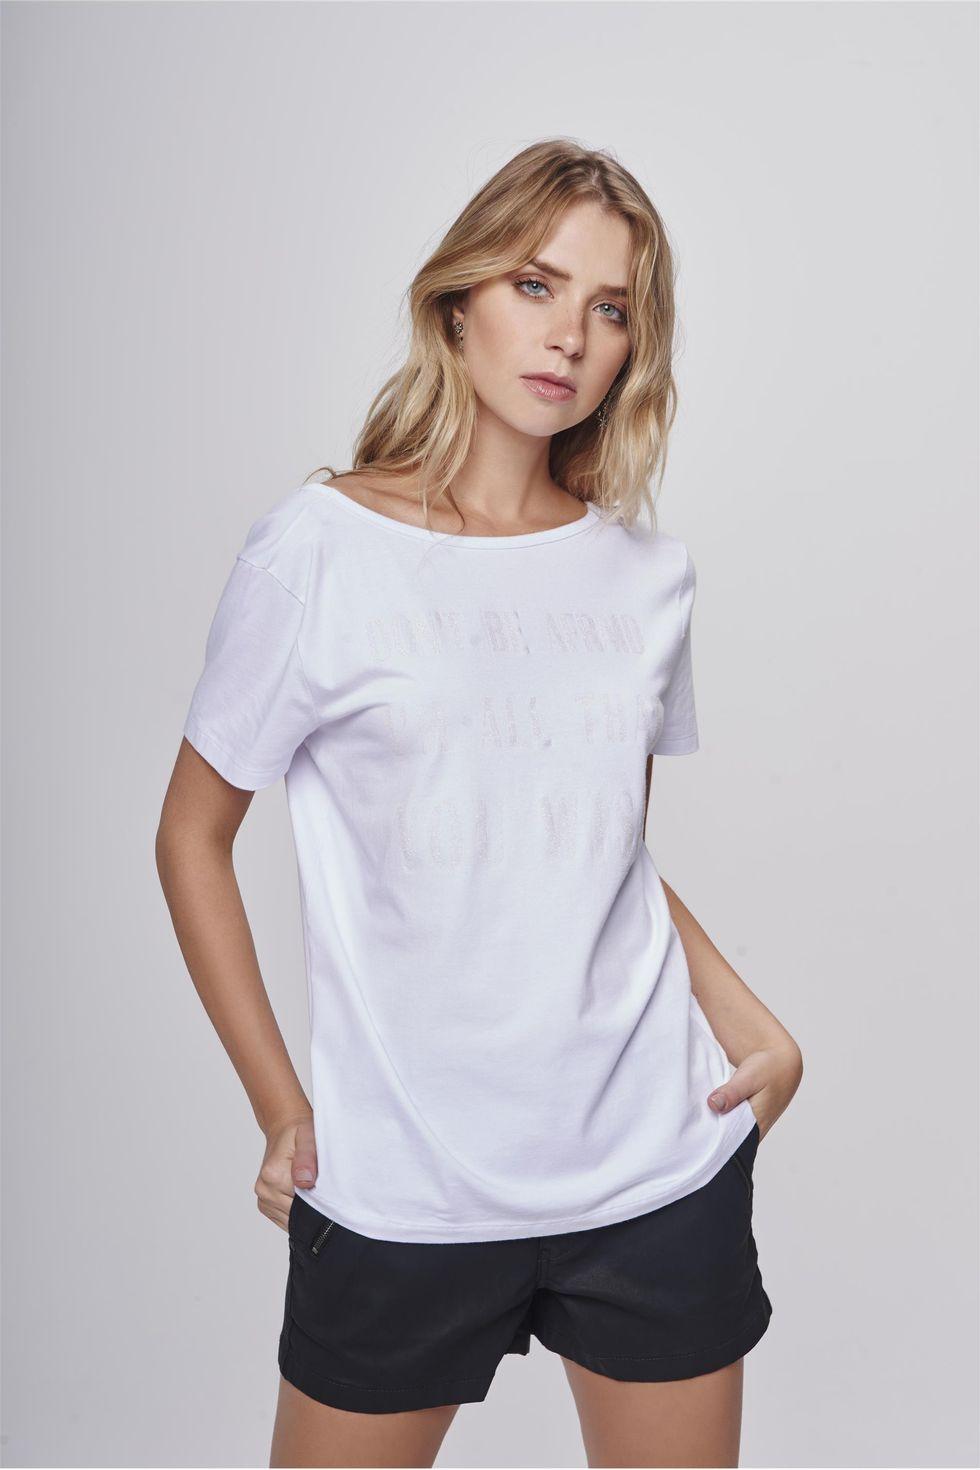 Blusa-Decote-Arredondado-Feminina-Frente--